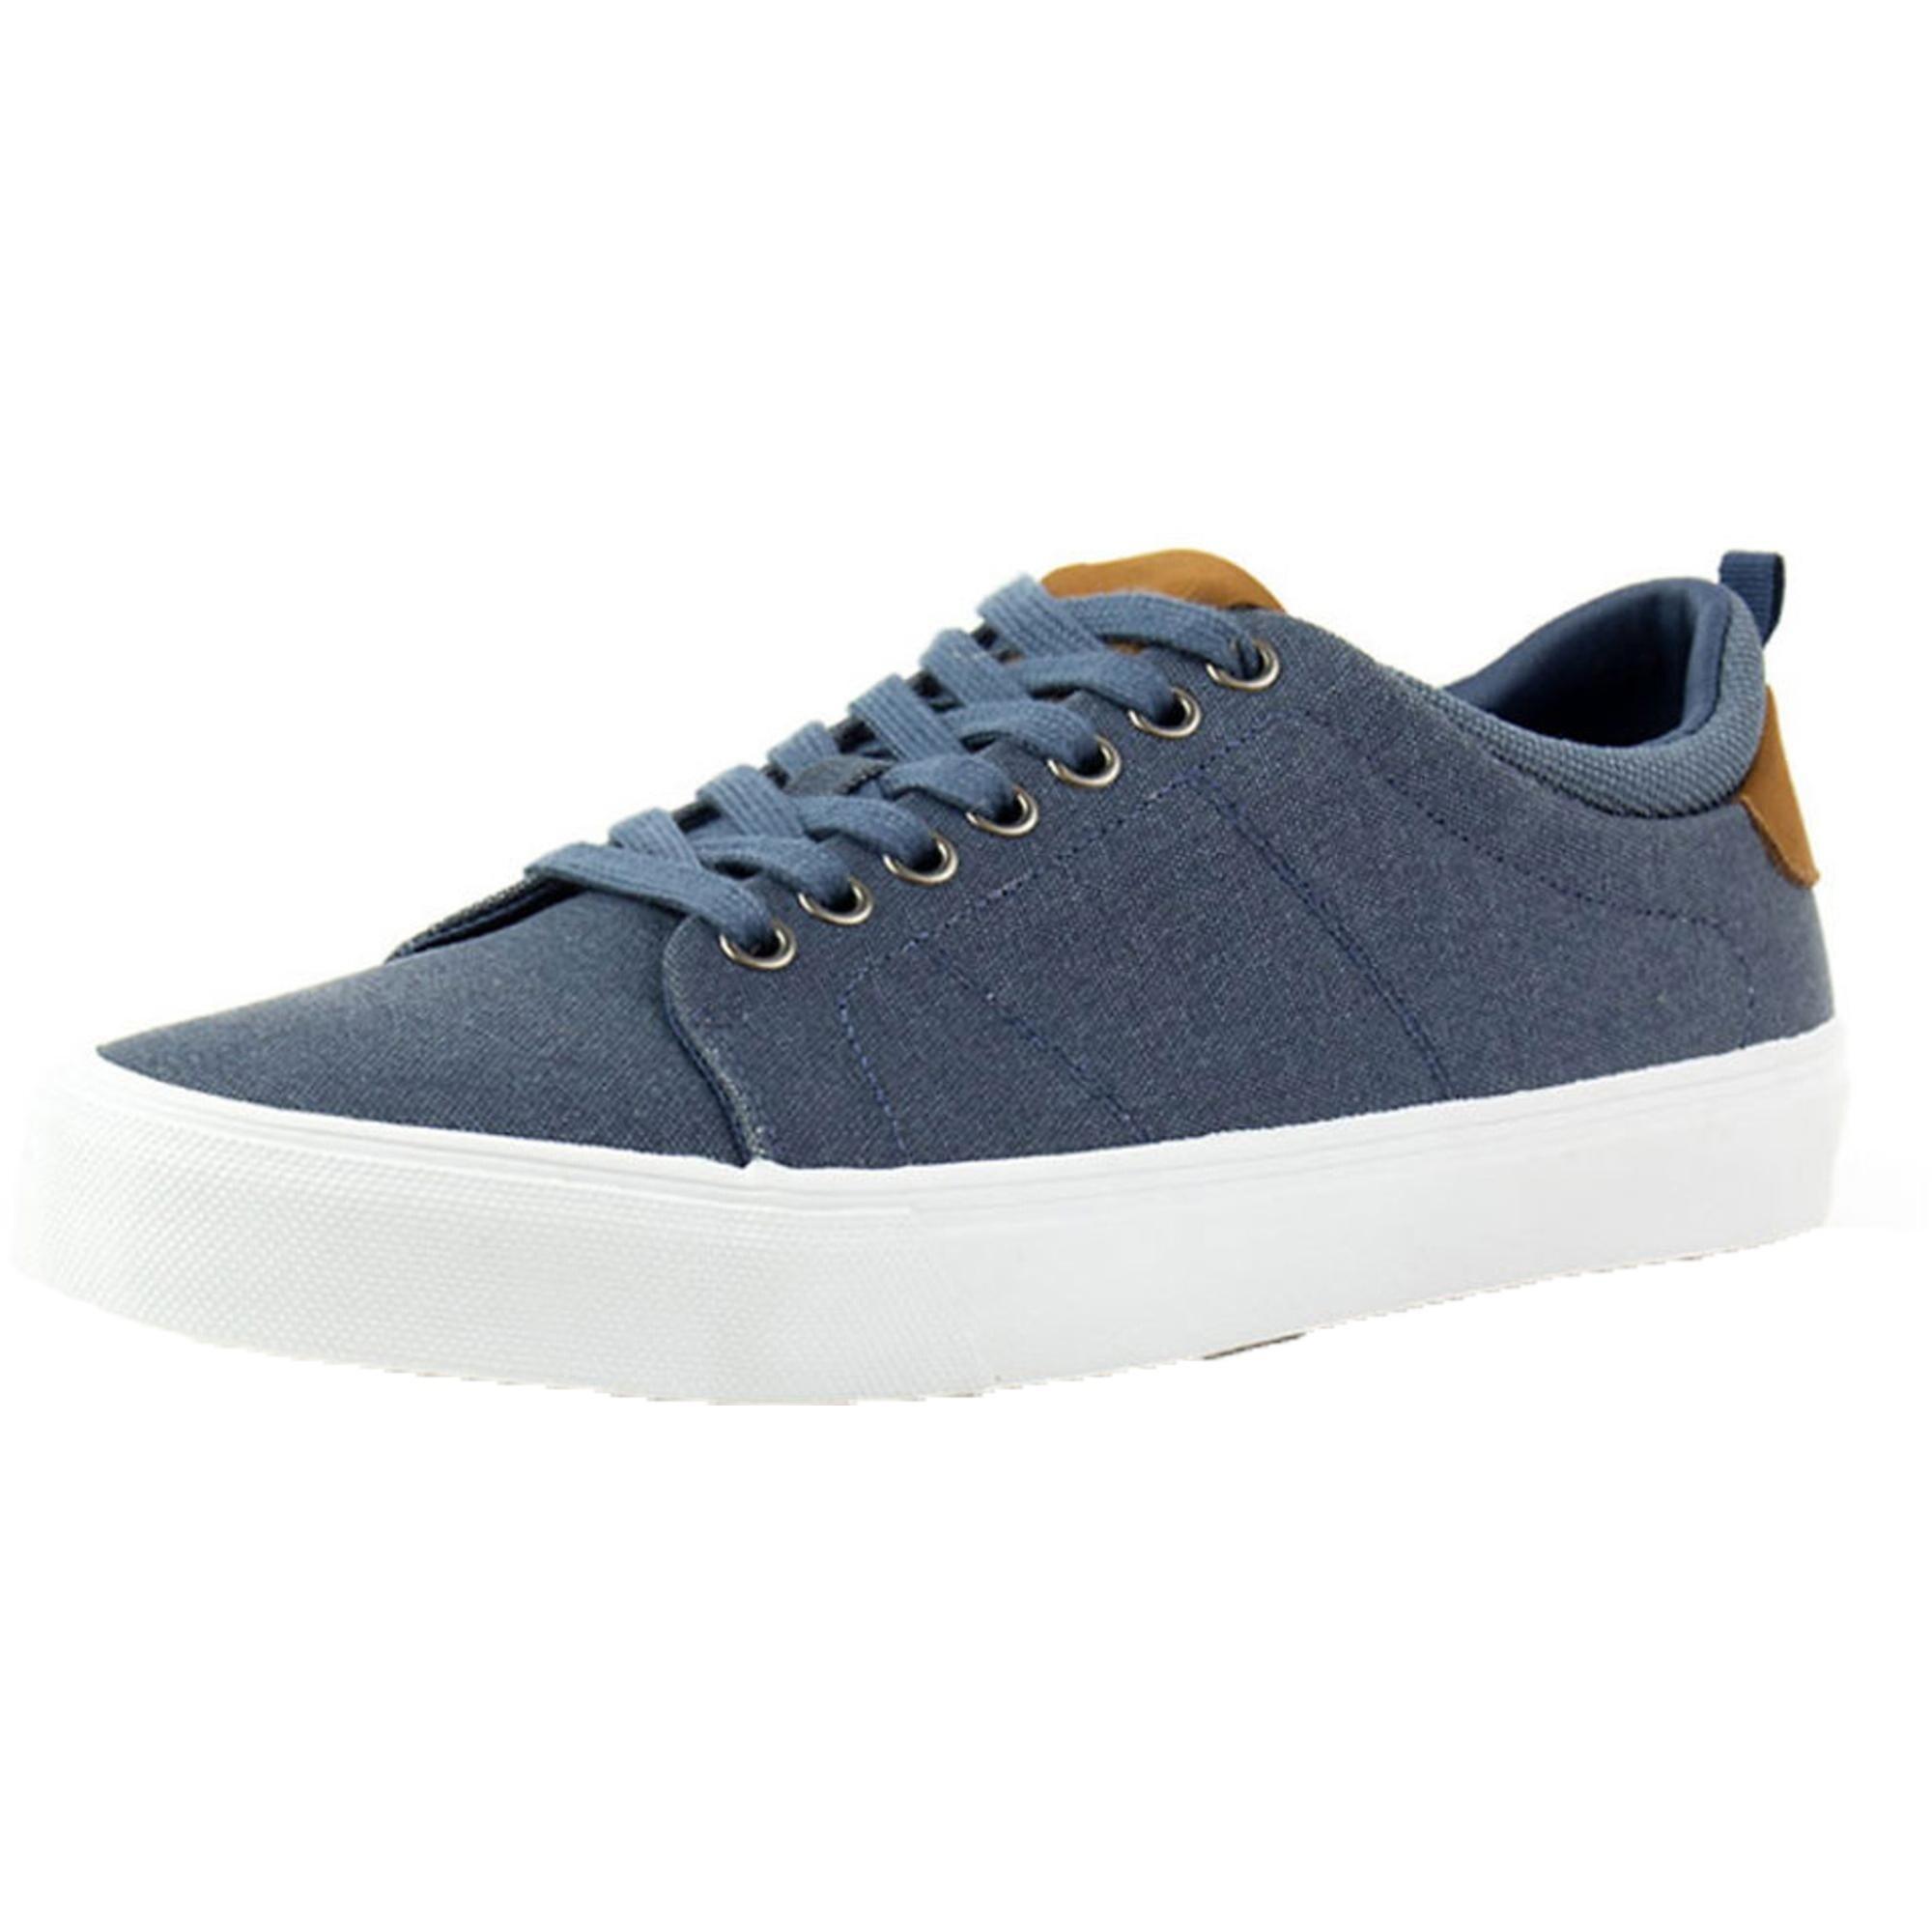 Shop Crevo Mens Brennon Casual Shoes